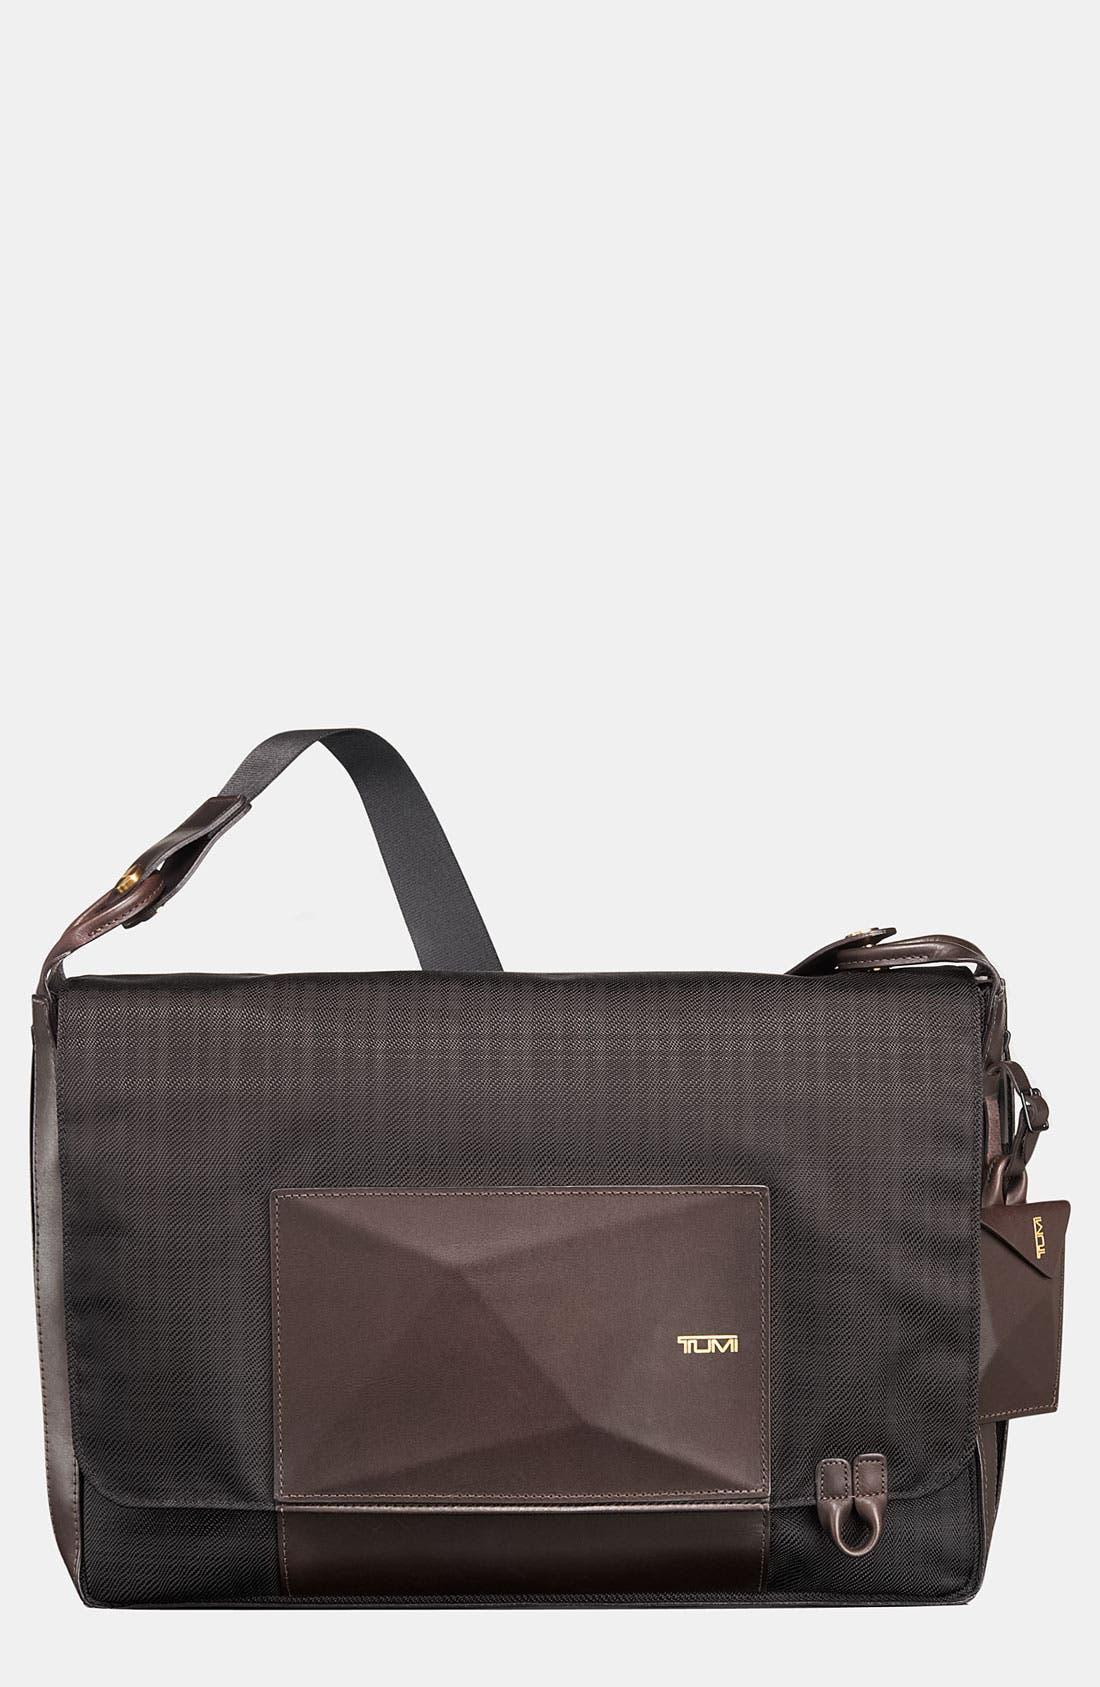 Alternate Image 1 Selected - Tumi 'Dror' Messenger Bag